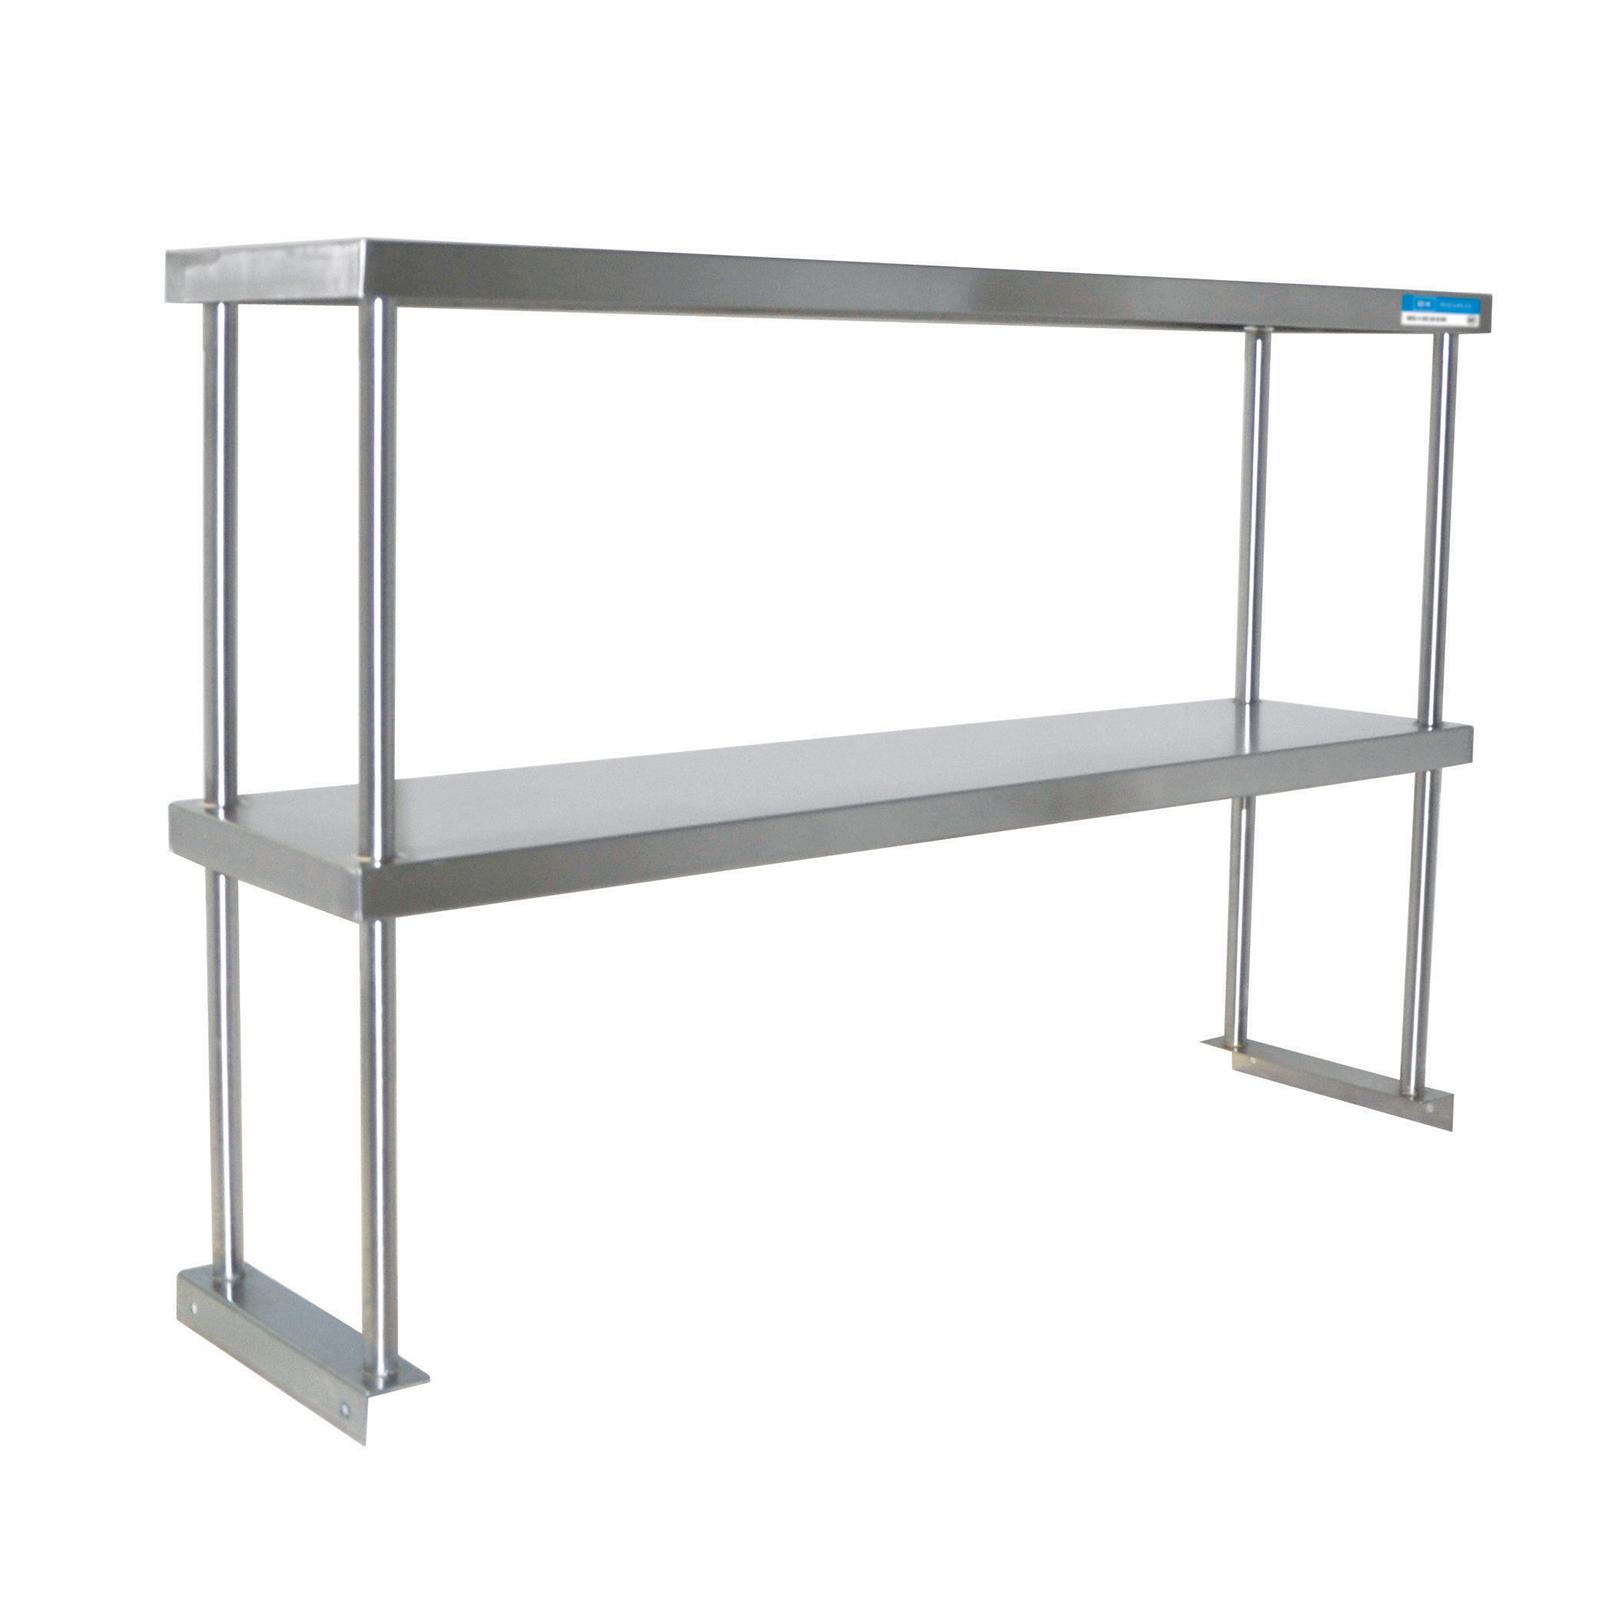 BK Resources BK-OSD-1236 overshelf, table-mounted